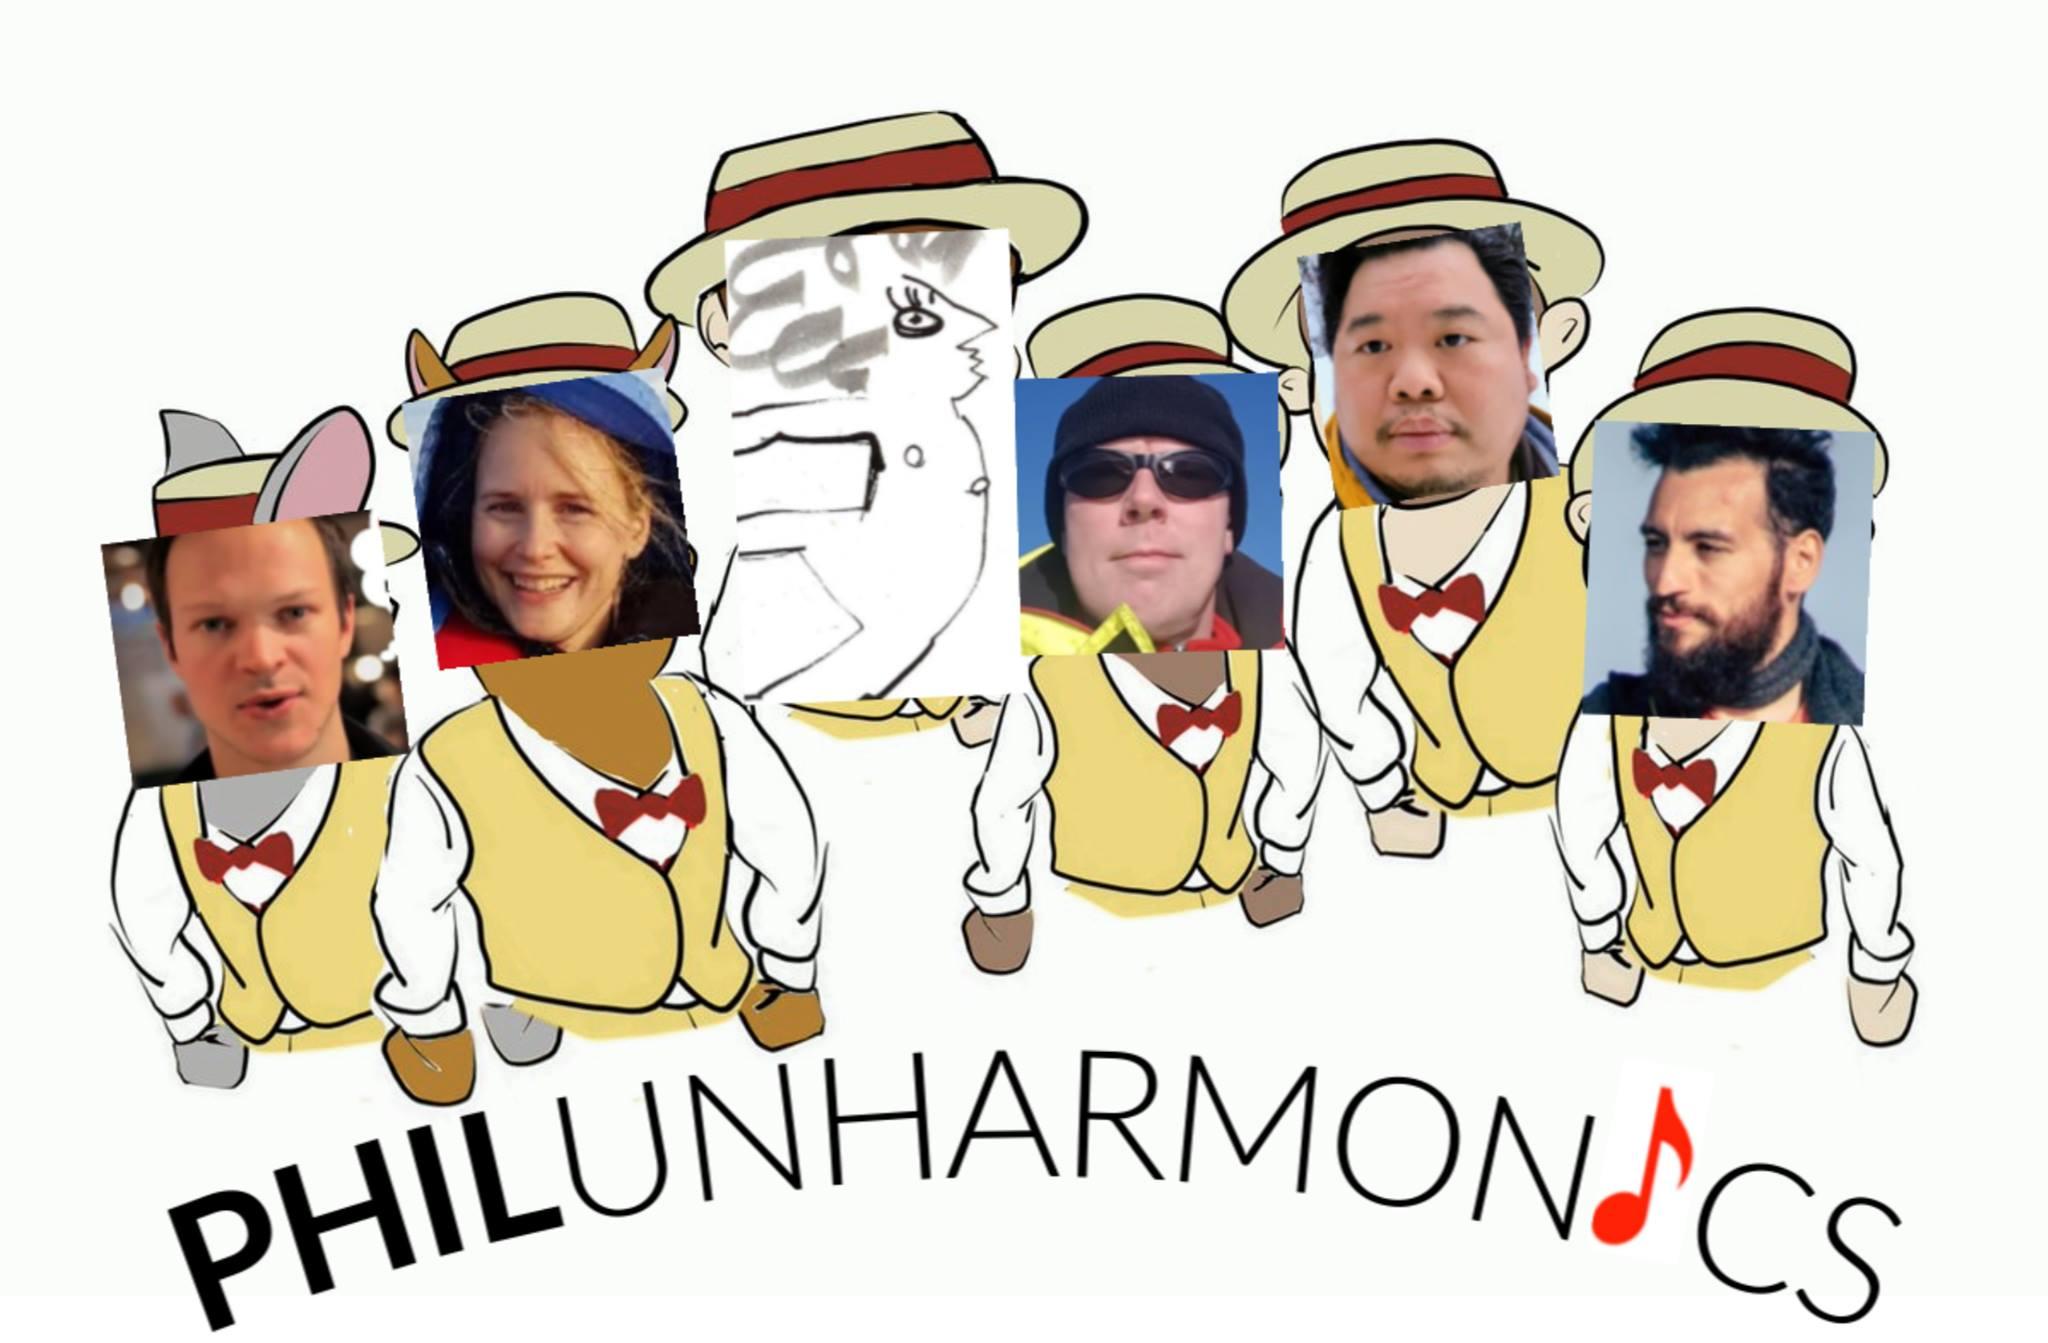 17:05 PHIL UNHARMONICS